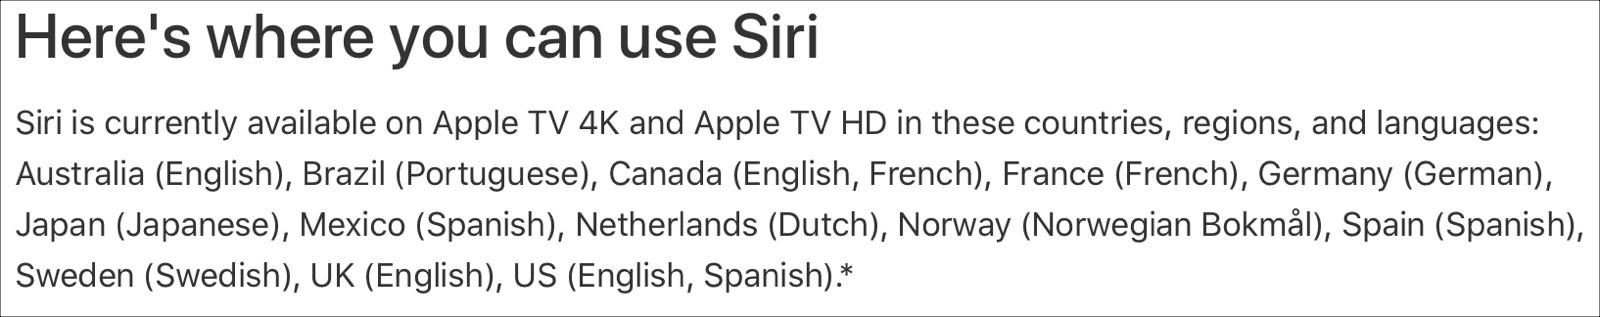 Apple Siri Supported Regions